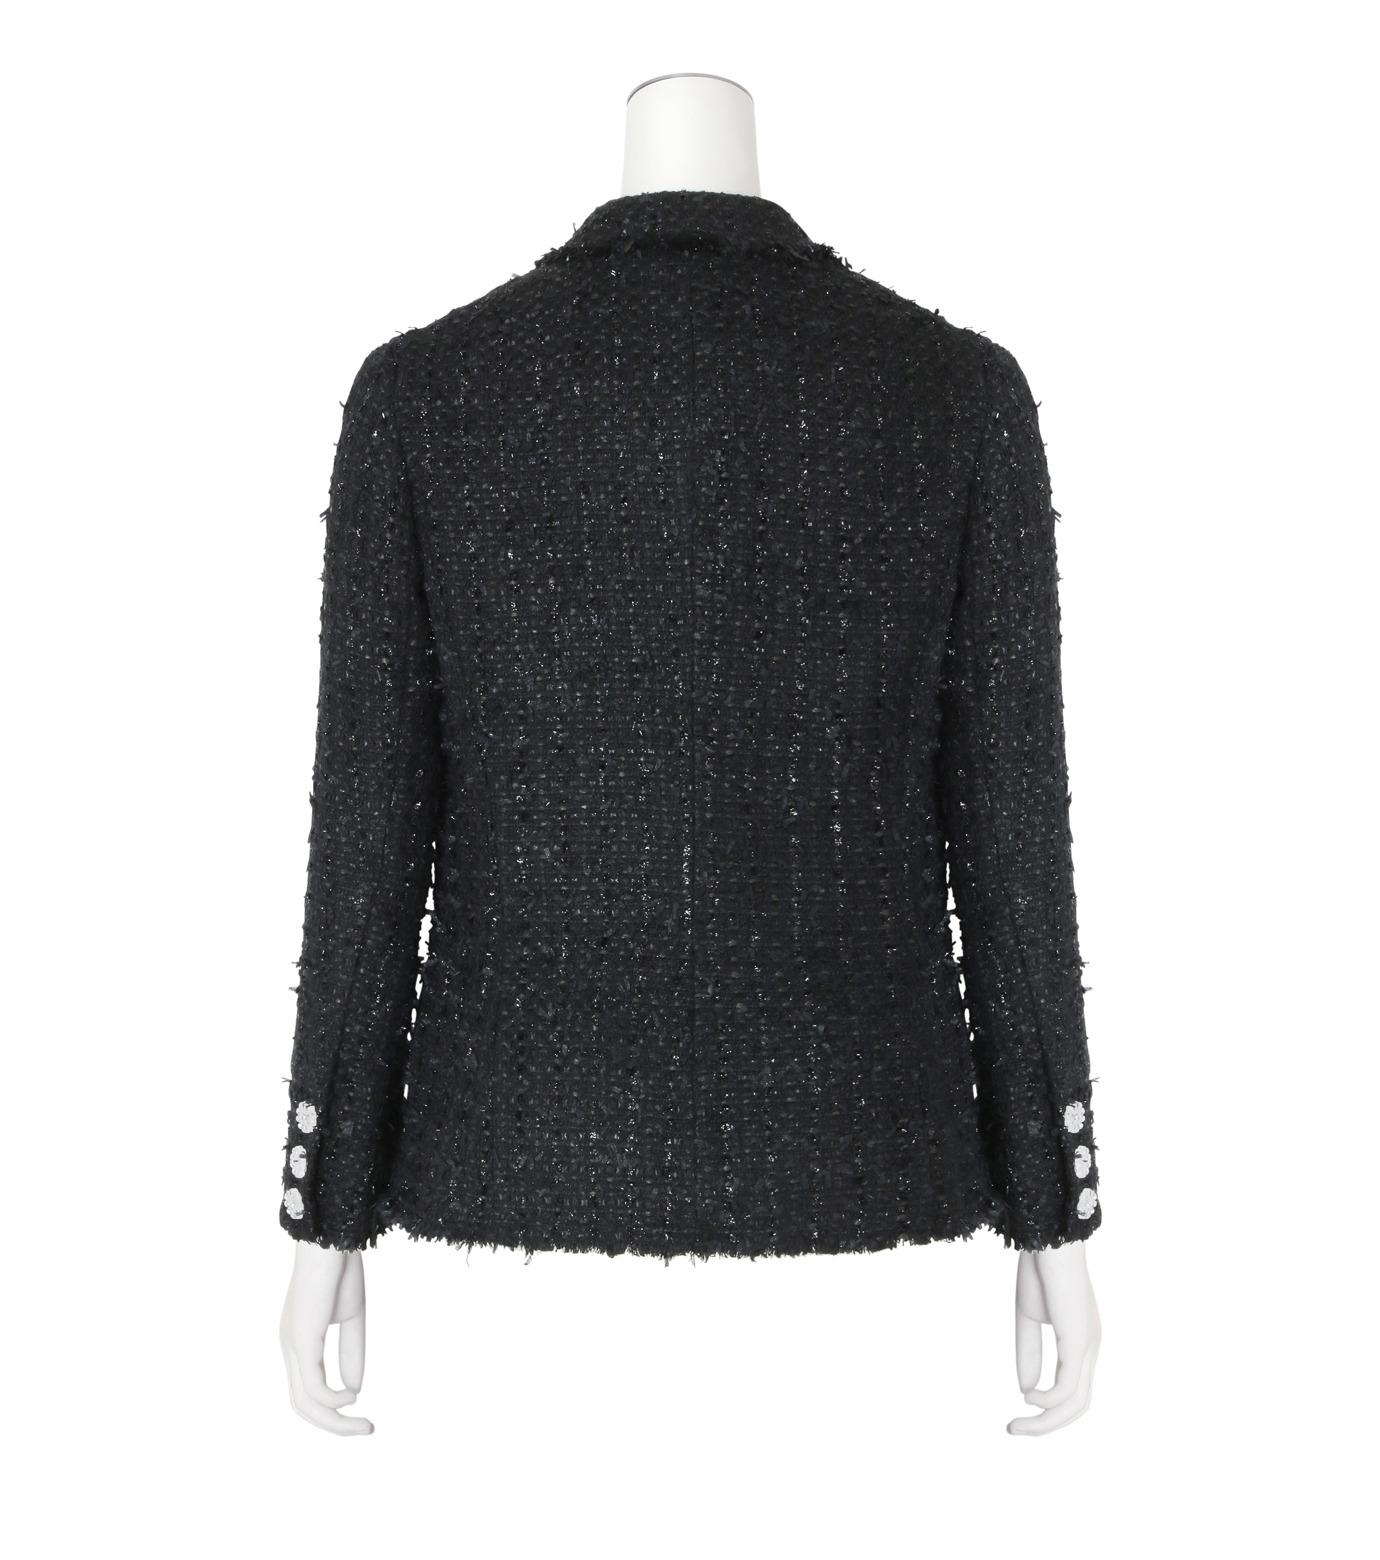 Simone Rocha(シモーネロシャ)のFine Tweed Fitted Jacket-BLACK(ジャケット/jacket)-3667-13 拡大詳細画像2